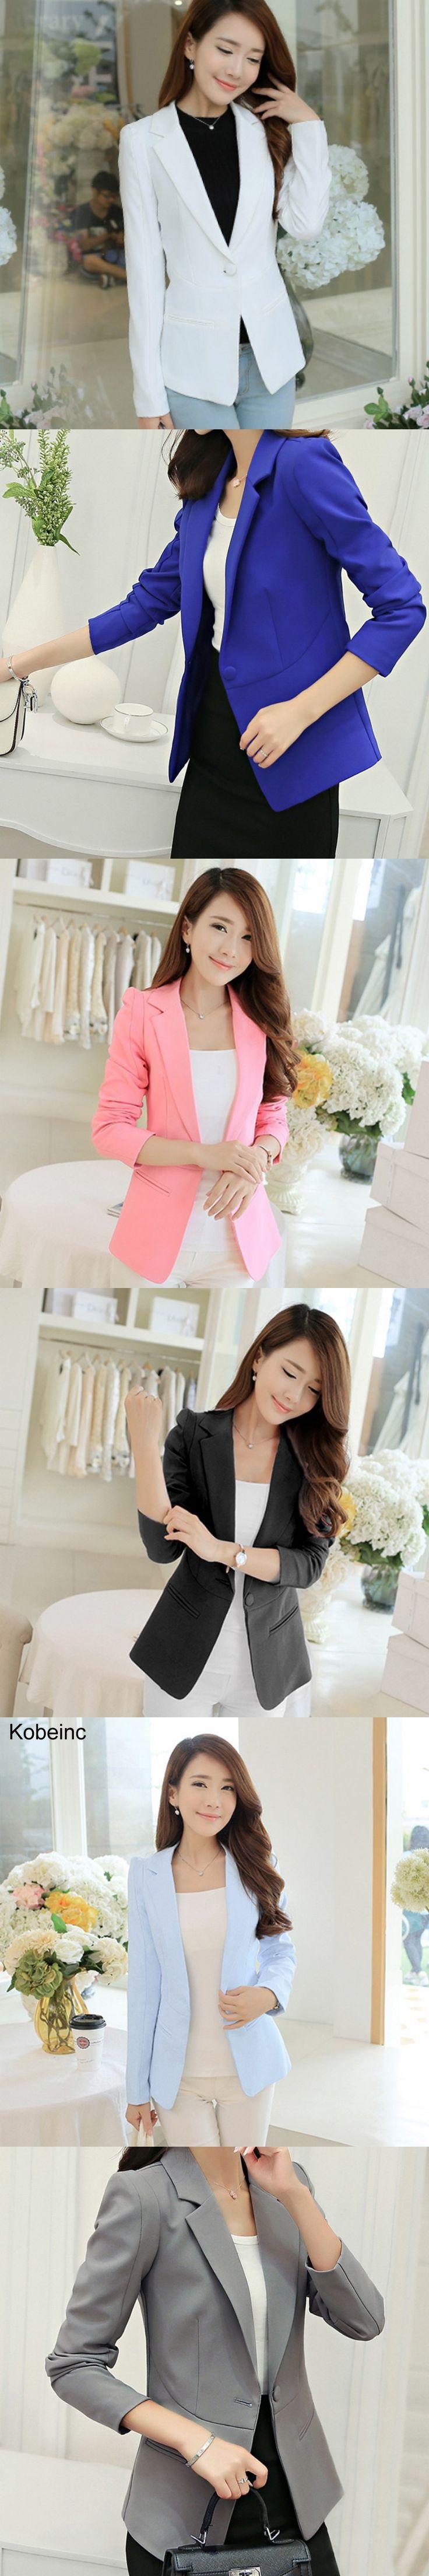 Kobeinc Women Blazers And Jackets Casual Single Button Blazer Femme Summer Korean Style Solid Lady Jacket Plus Size S-XXL